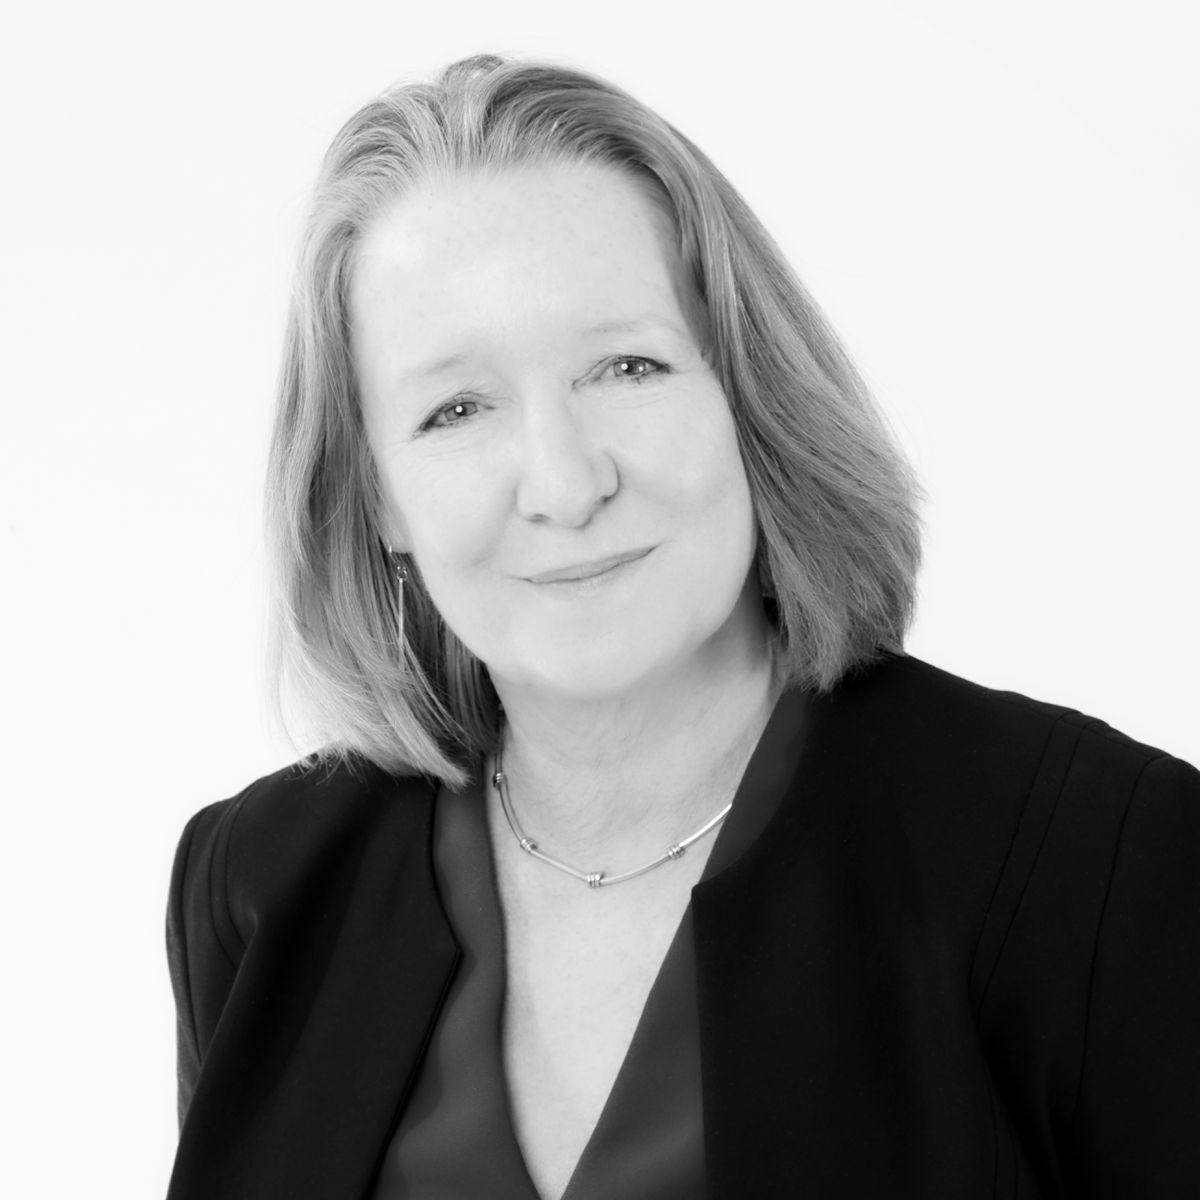 Labour Pary pollster Deborah Mattinson